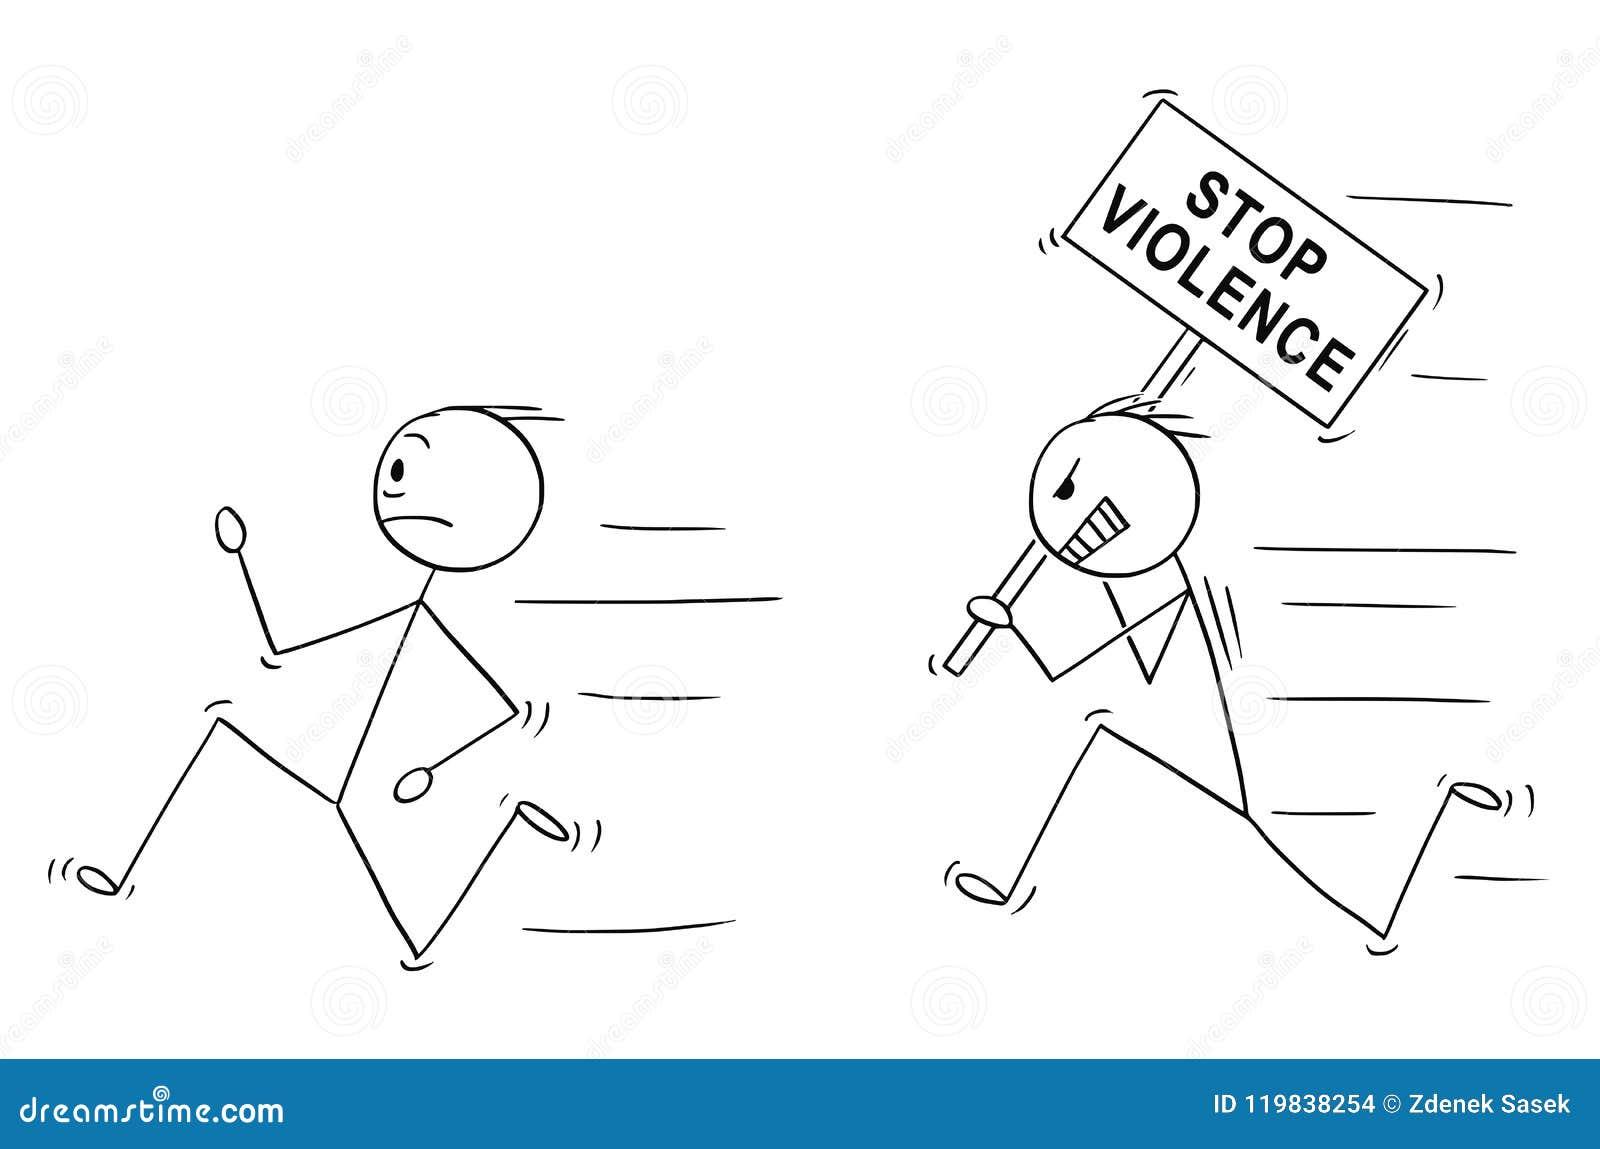 Historieta de la muestra violenta enojada de la violencia de la parada de la tenencia del hombre que persigue a otro hombre